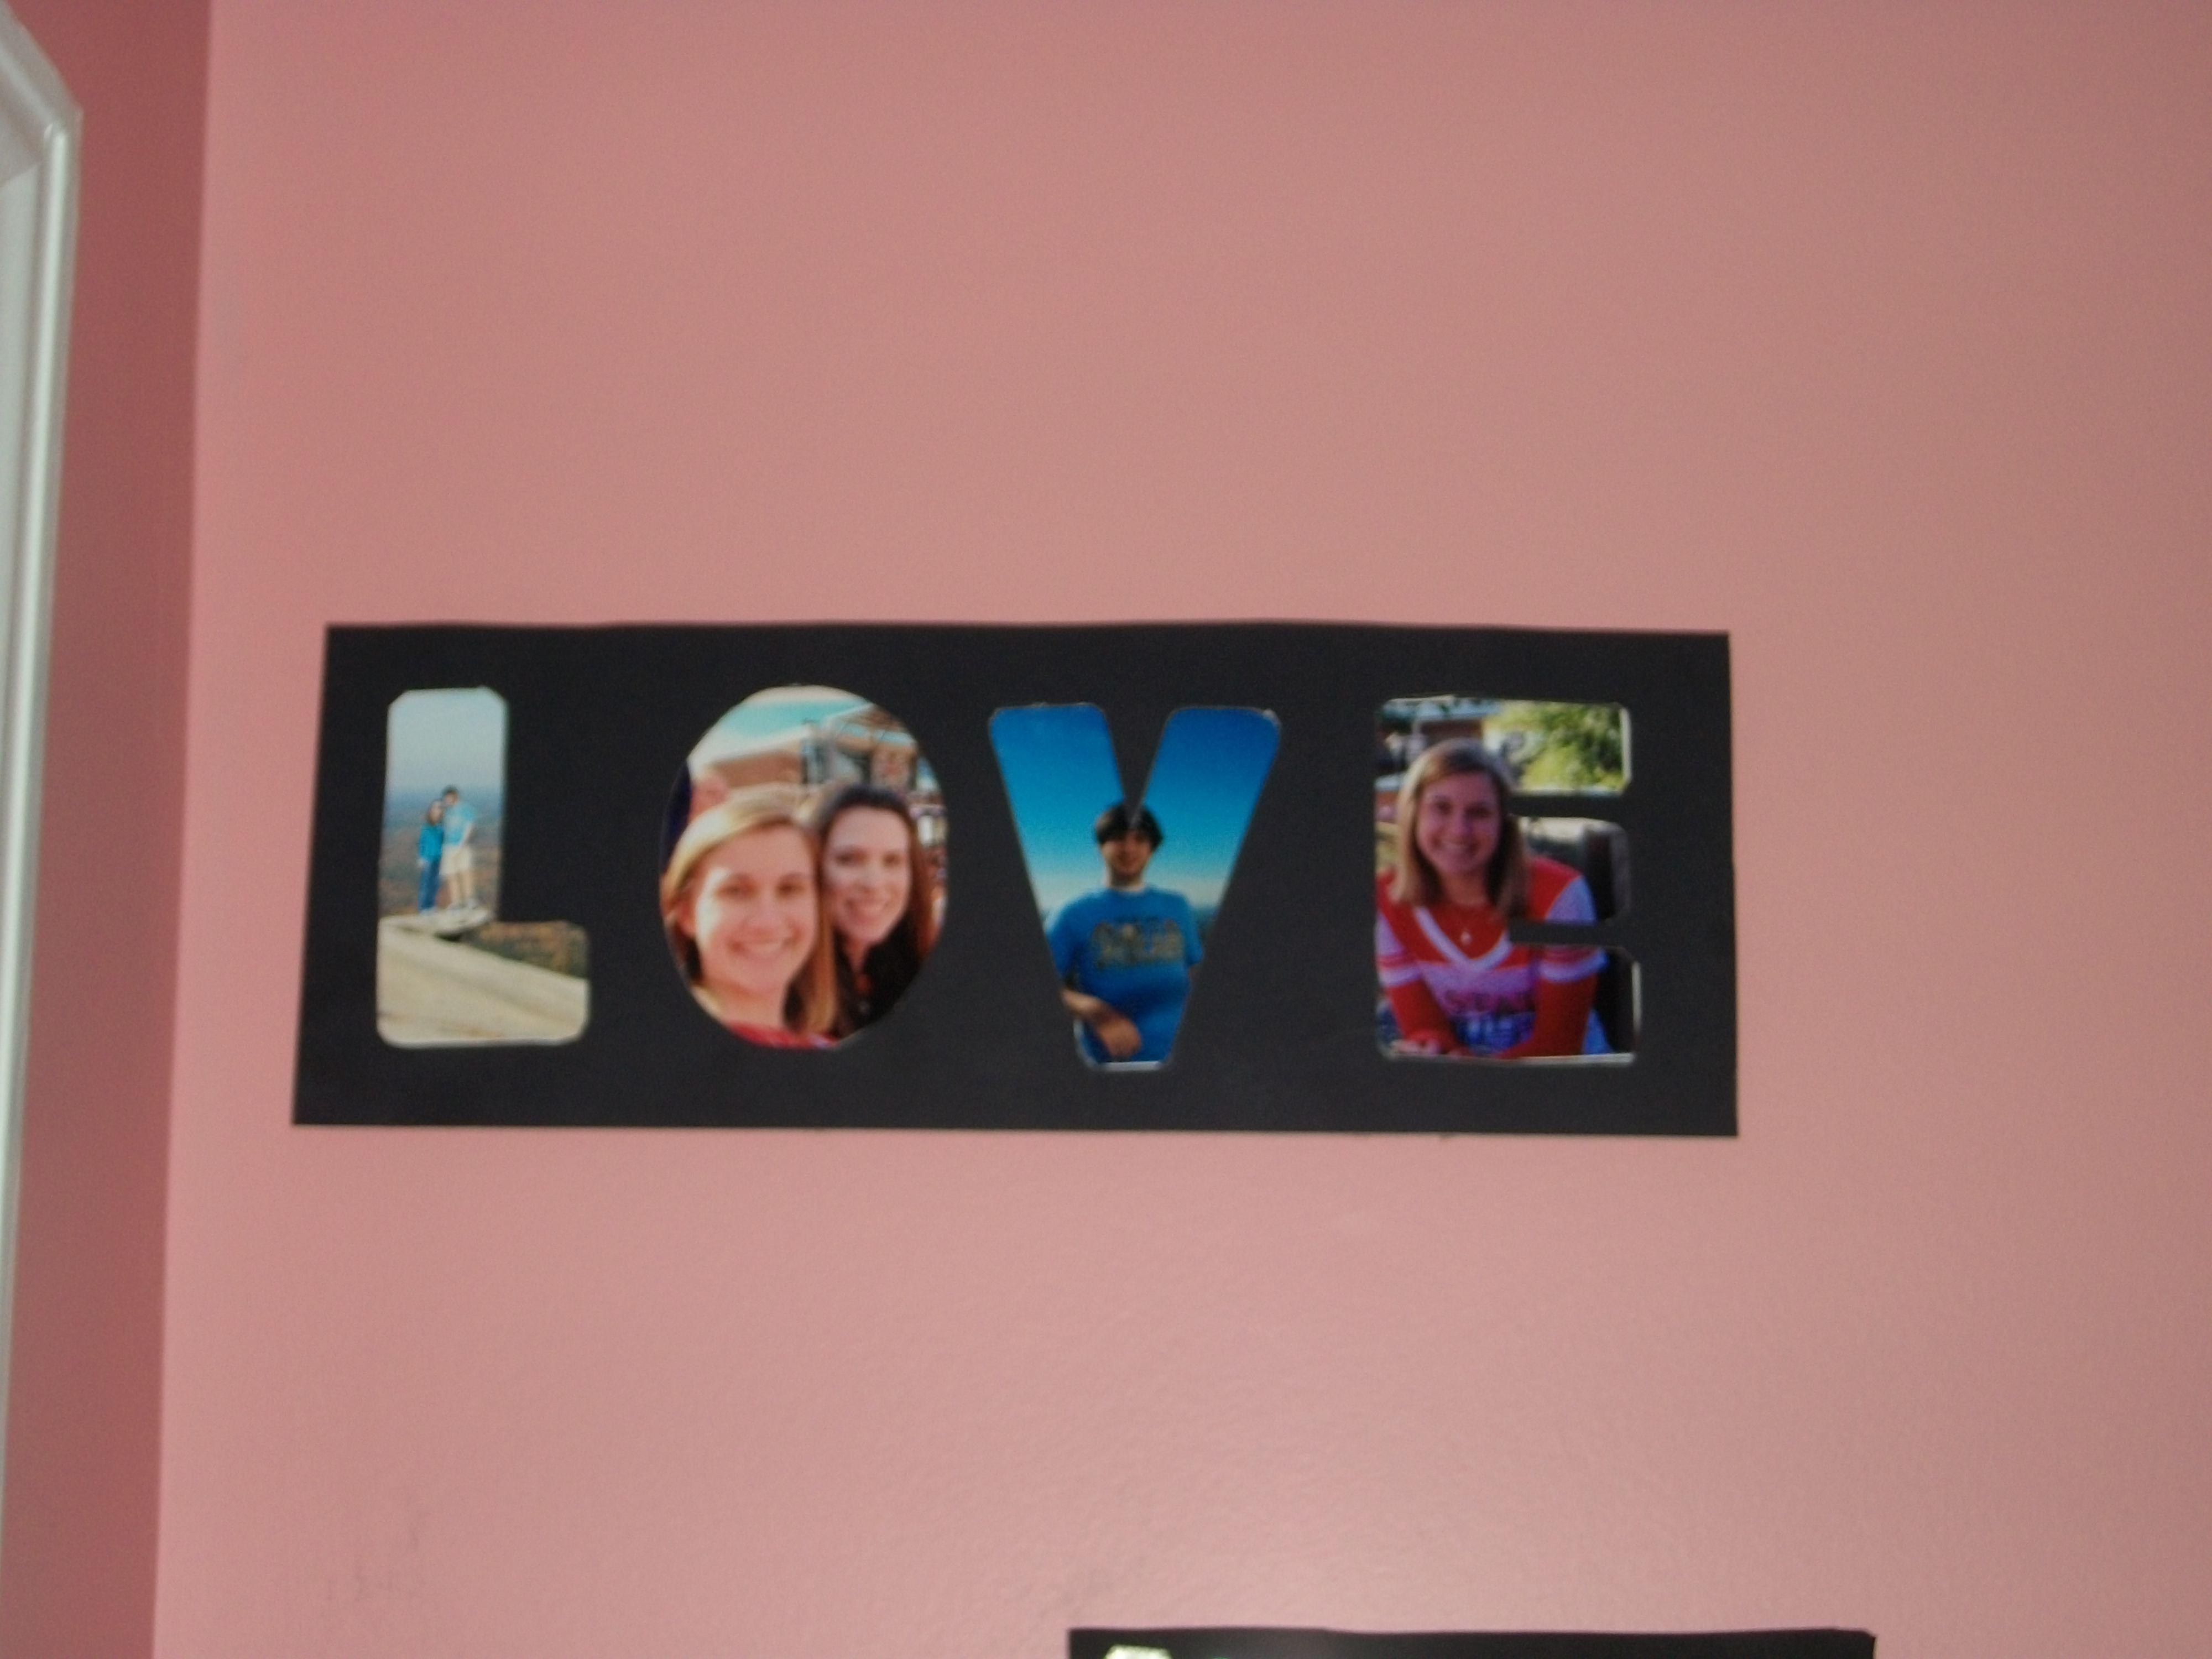 frame made using black poster board